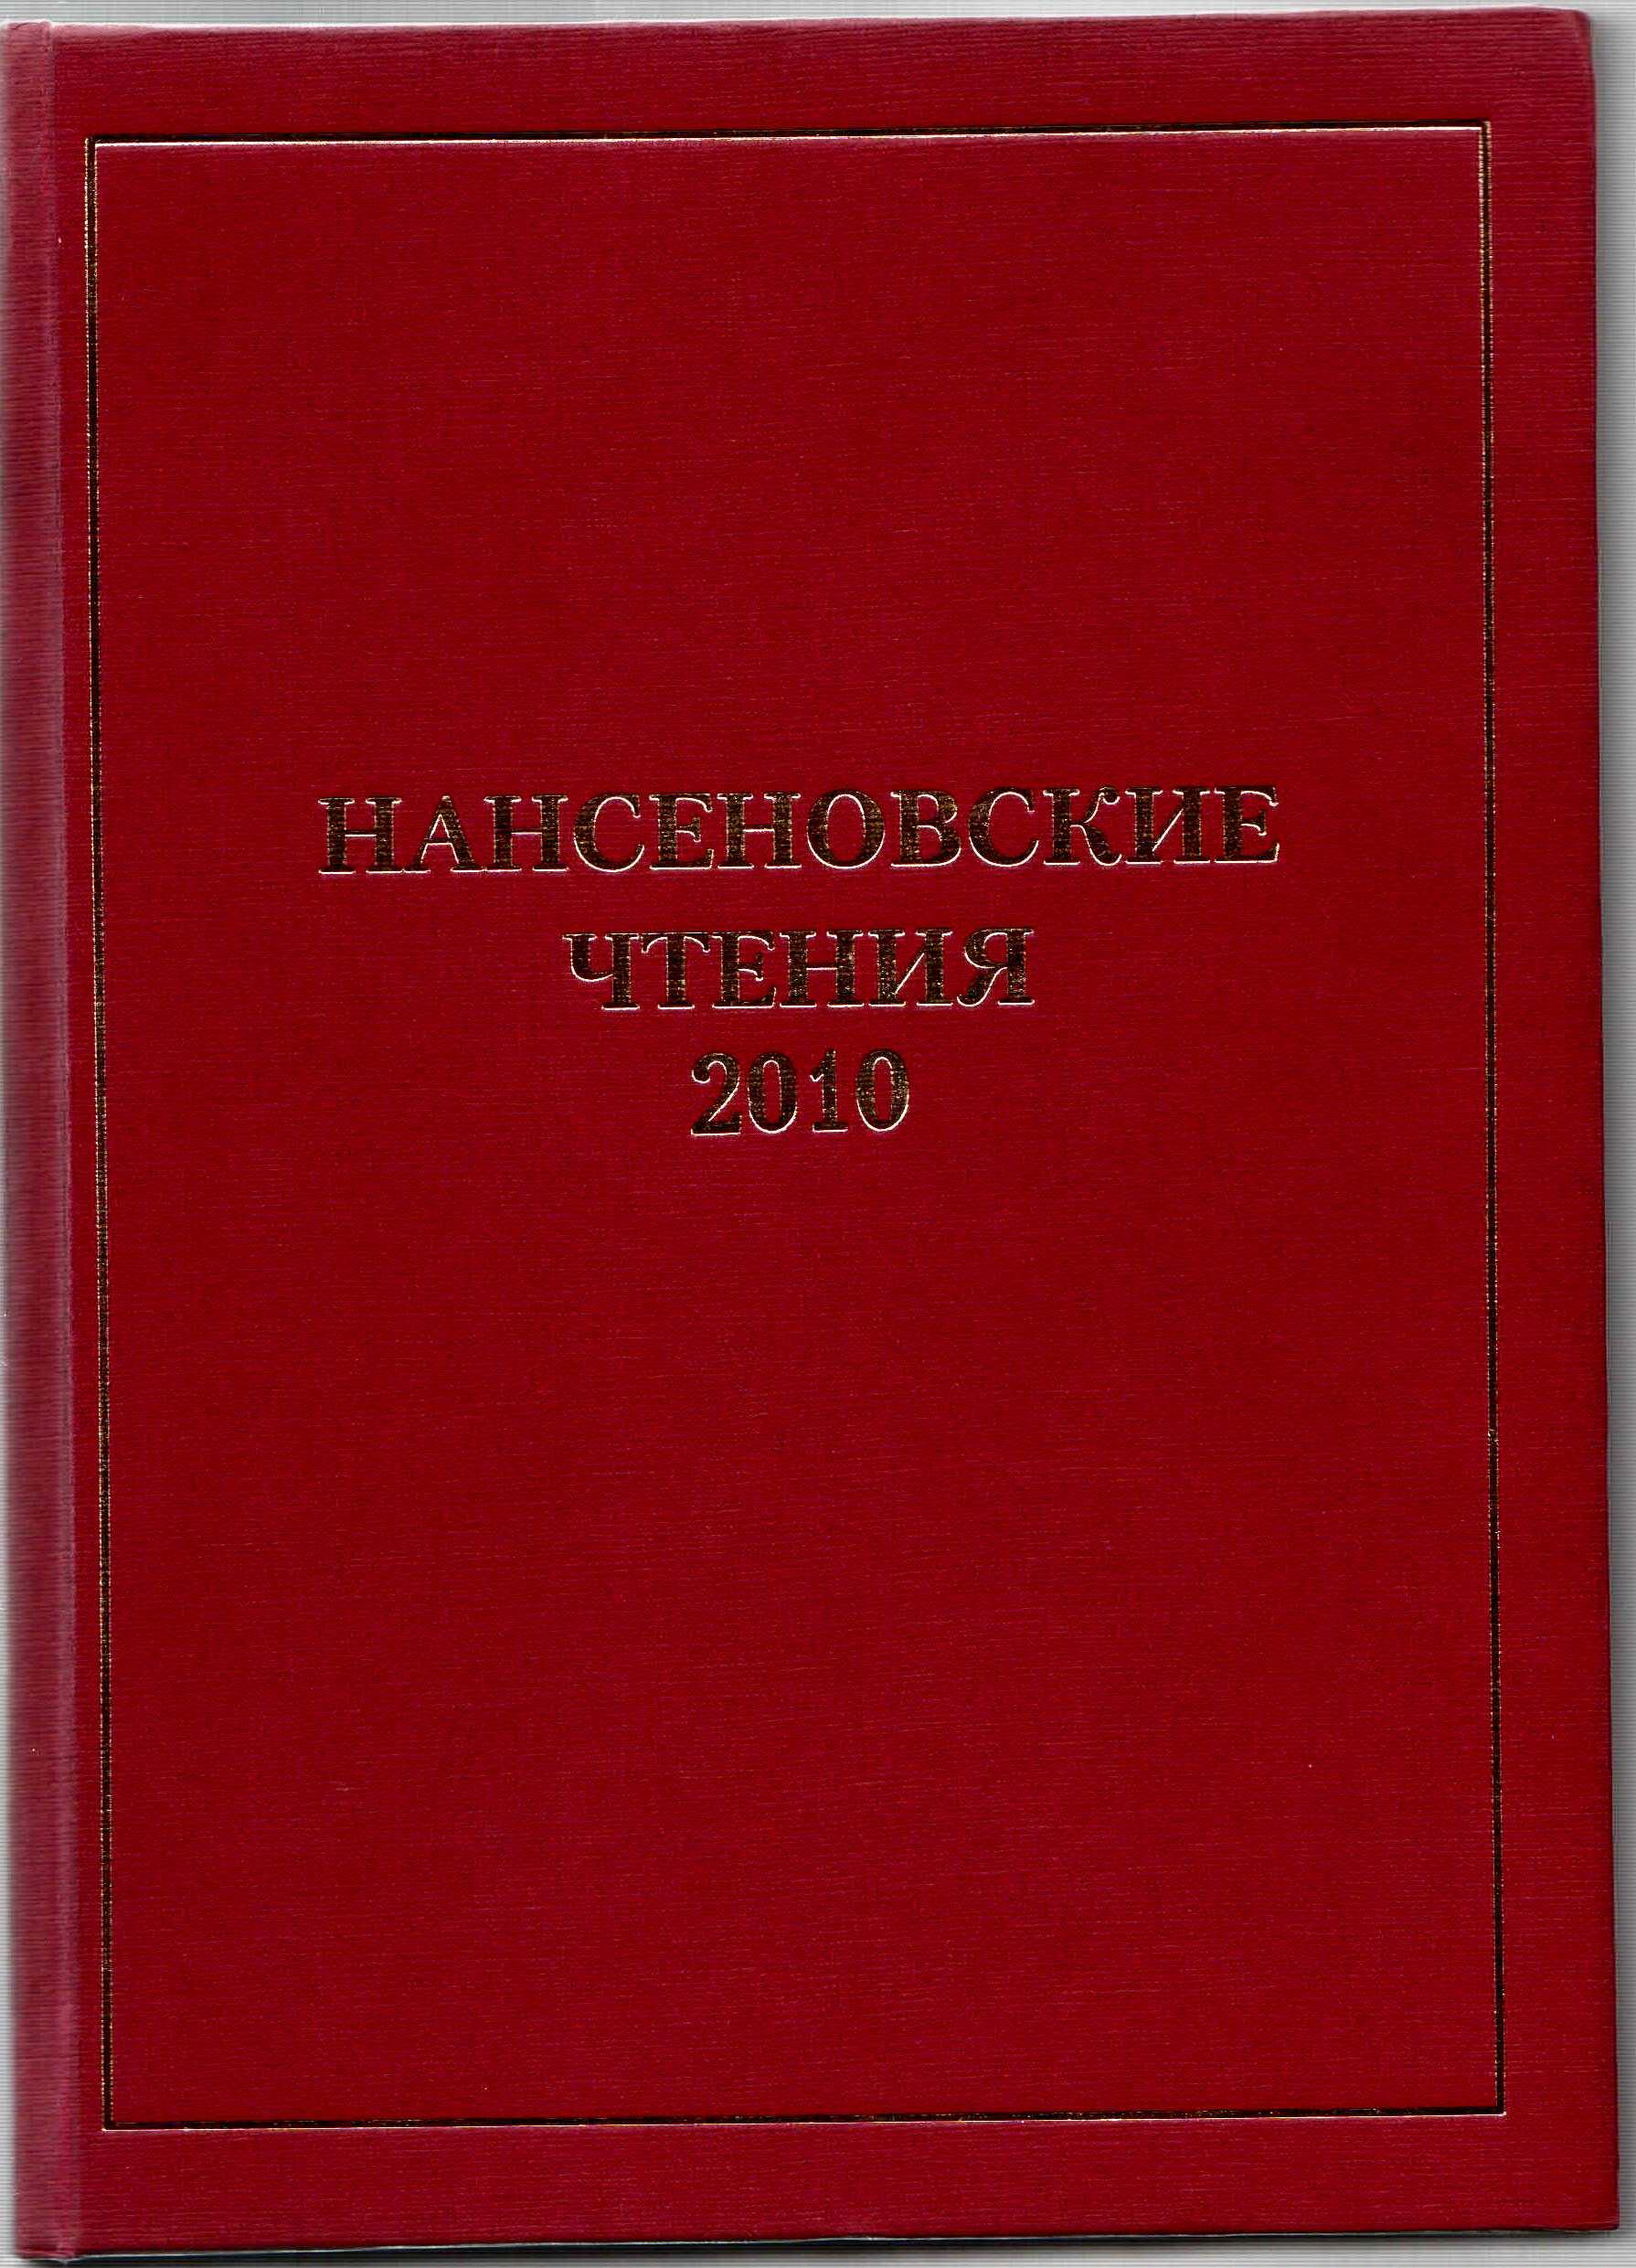 Нансеновские чтения 2010